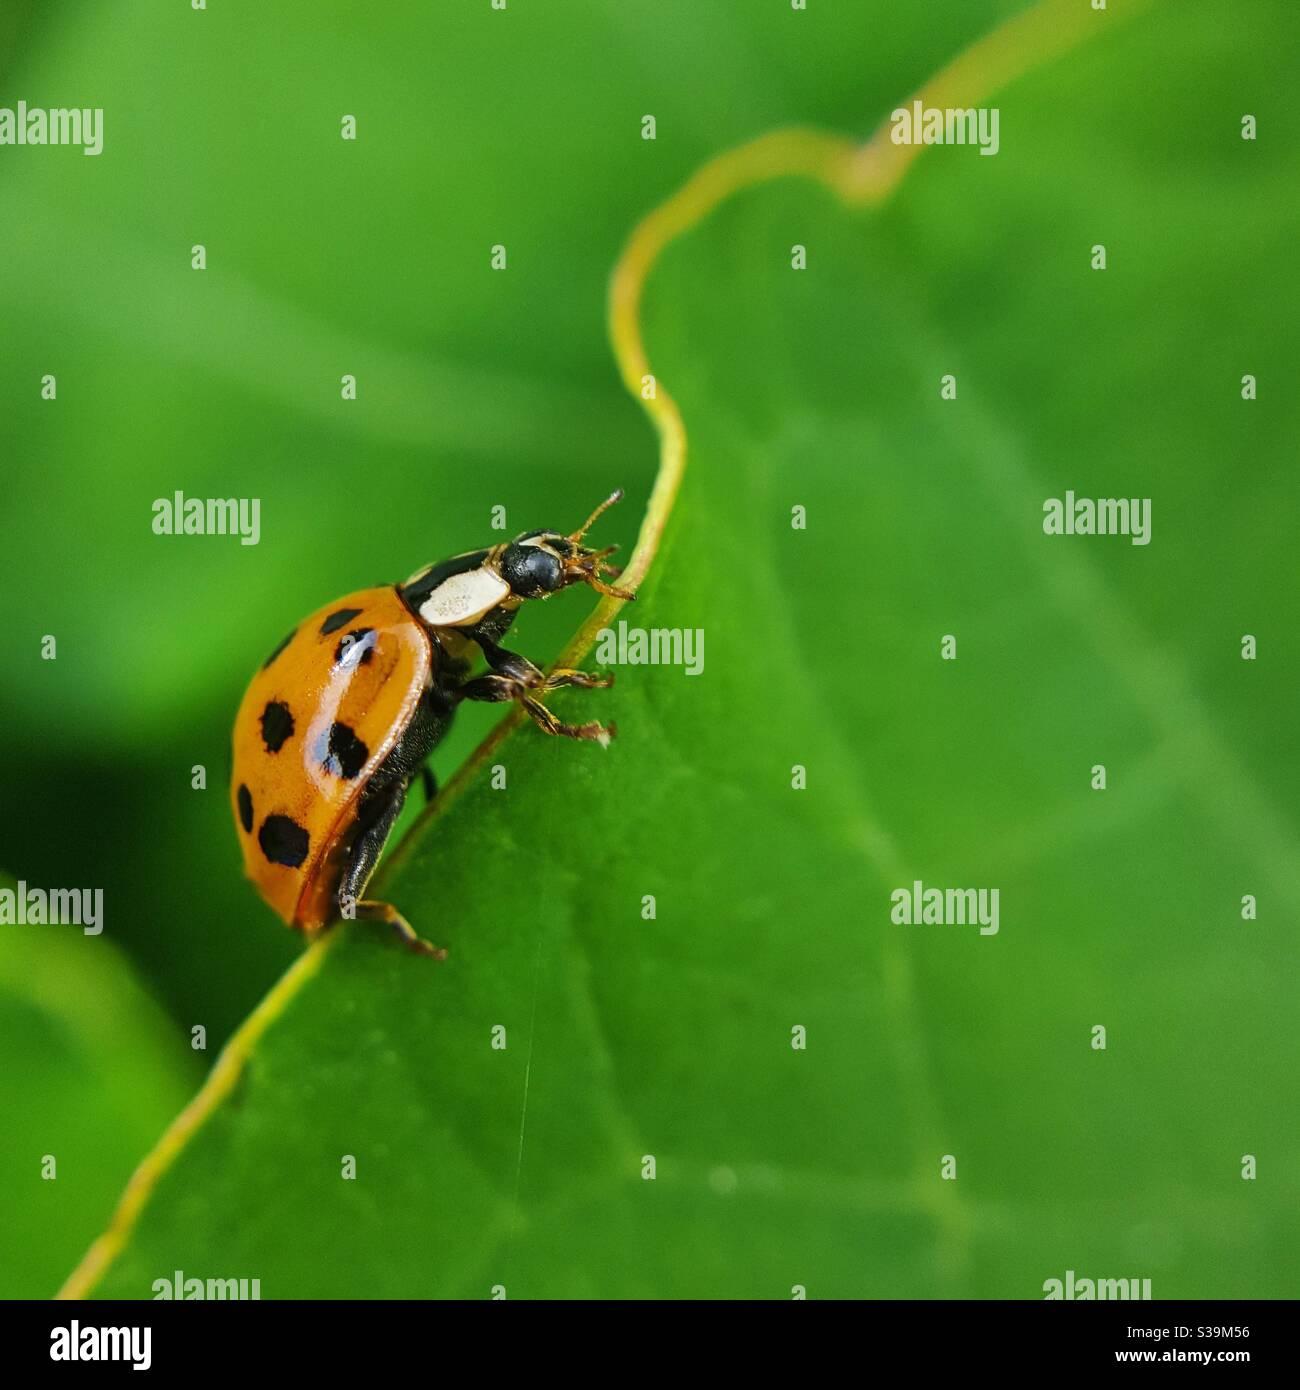 Harlequin Ladybird Hoja de Escalada Foto de stock